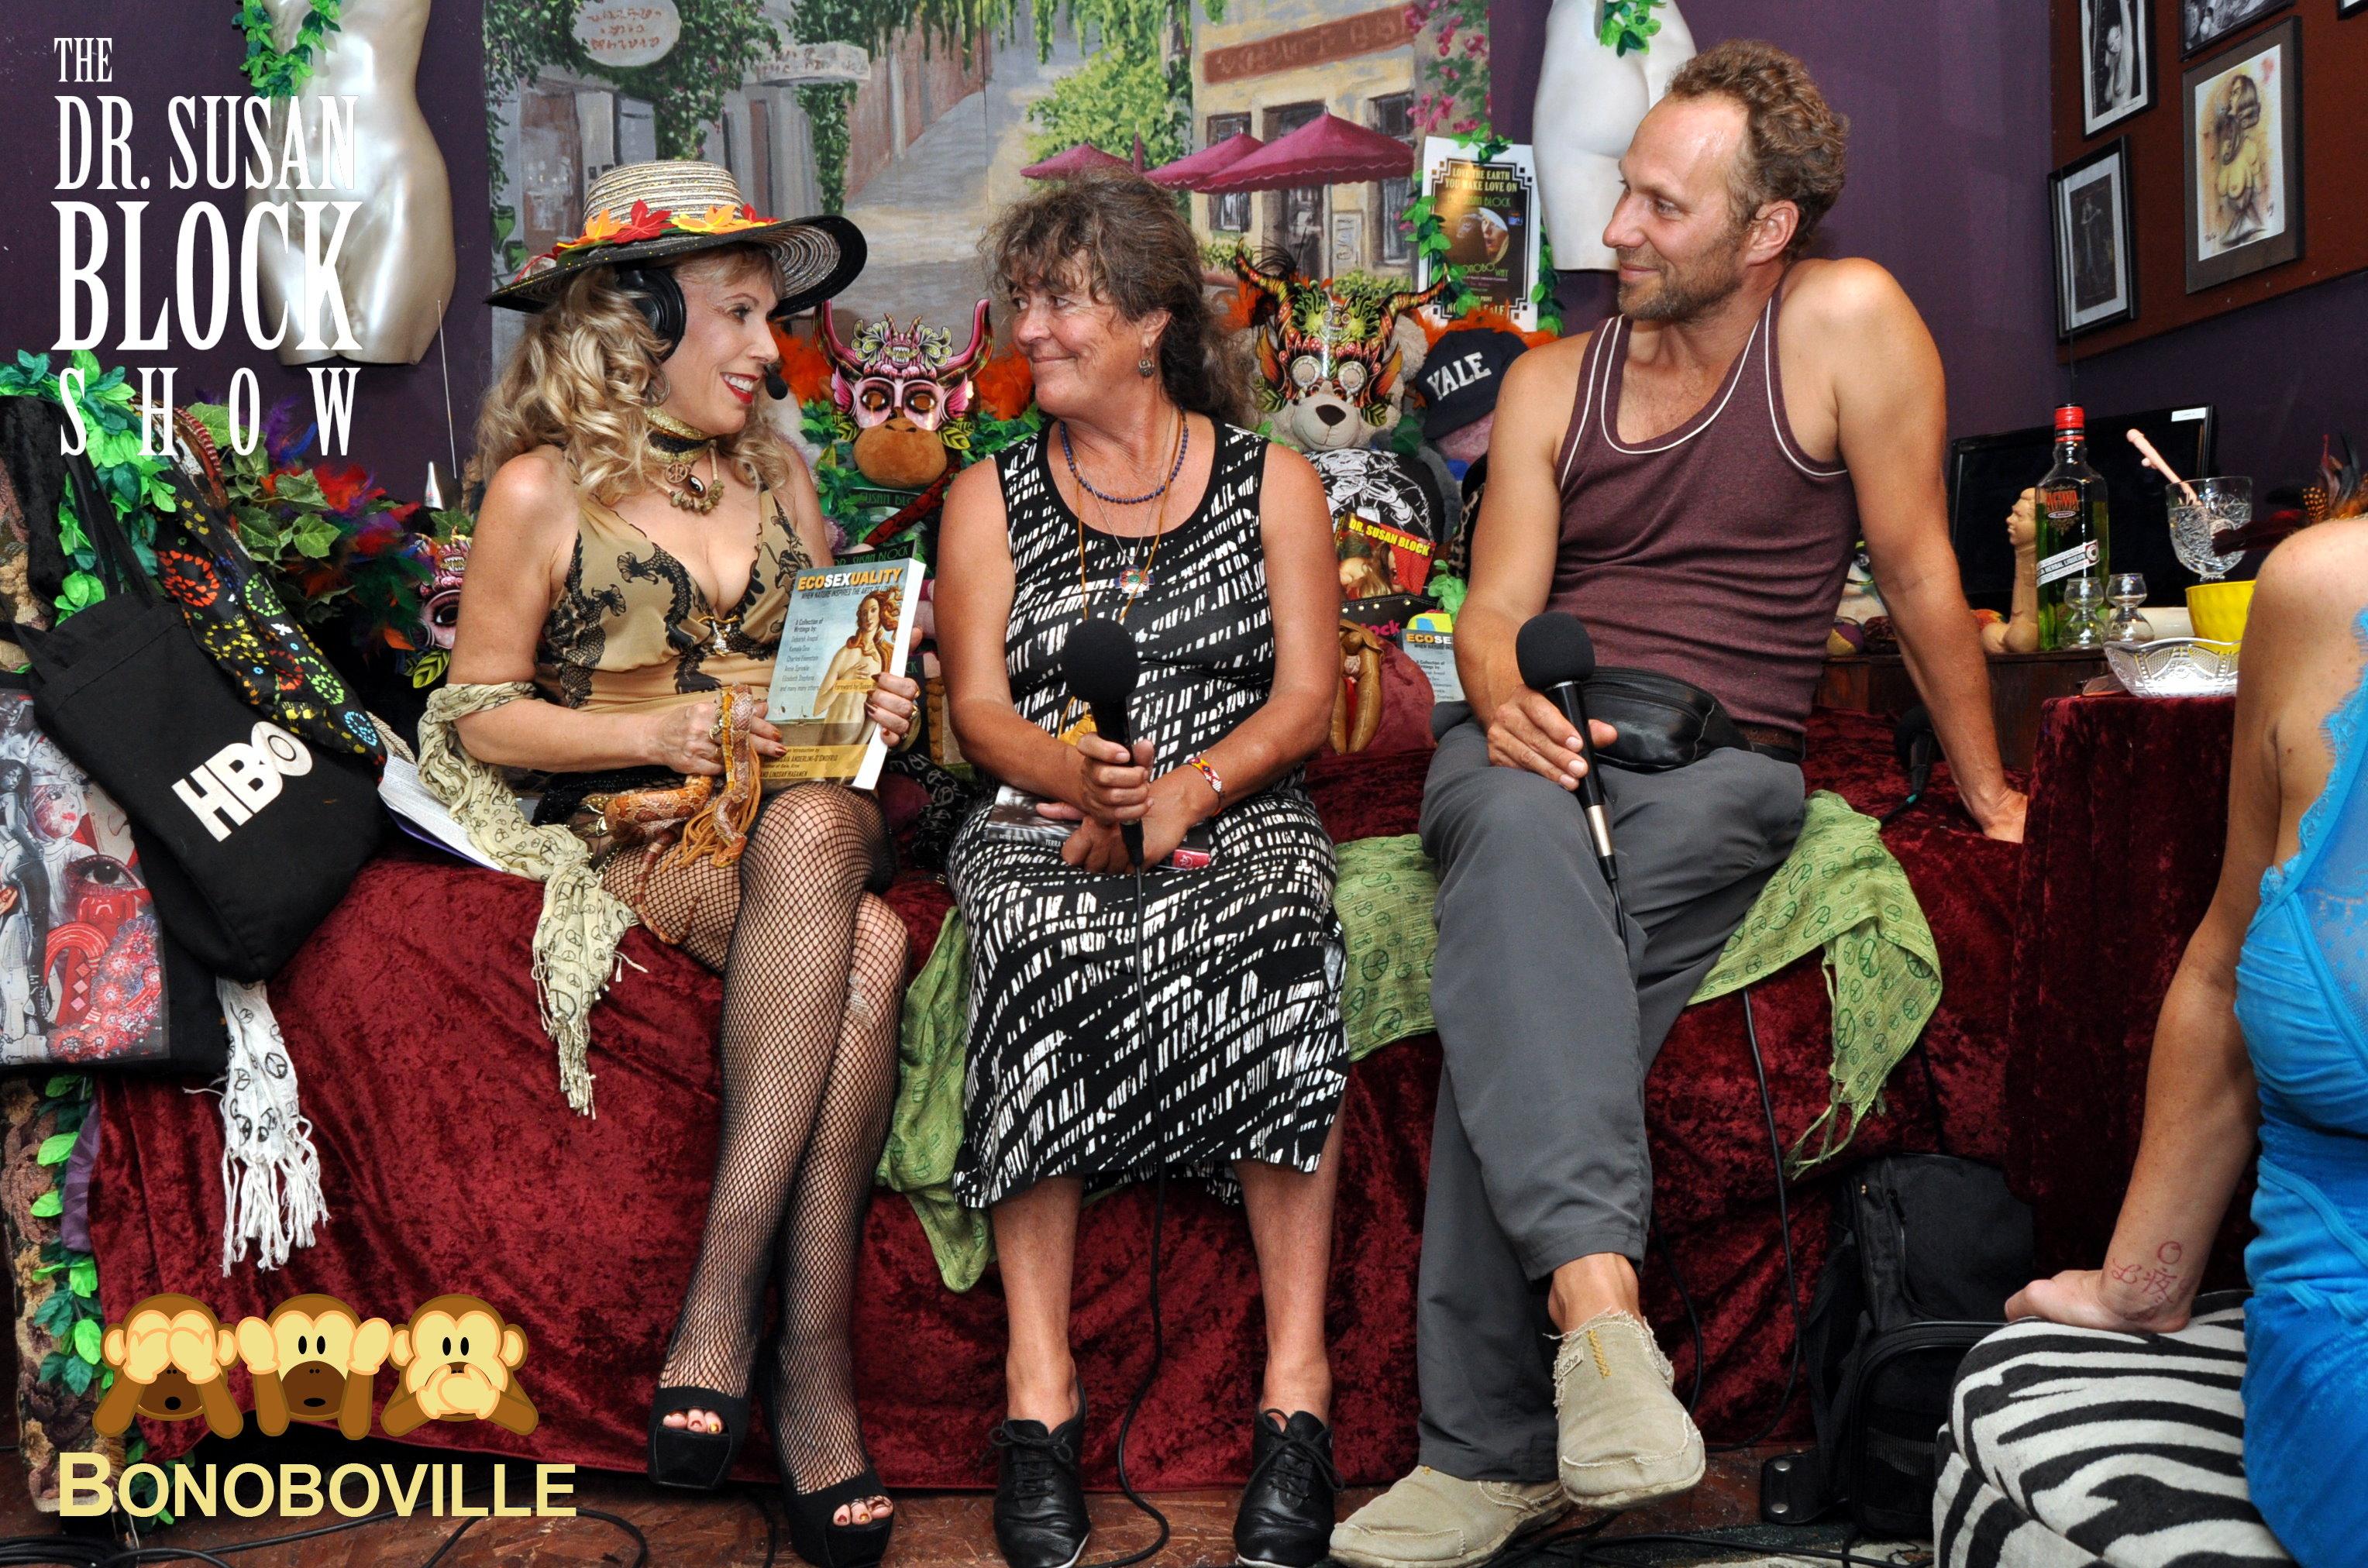 Talking about Ecosexuality with Tamera & Terra Nova leaders Sabine Lichtenfels & Benjamin von Mendelssohn. Photo: RingoShotYou